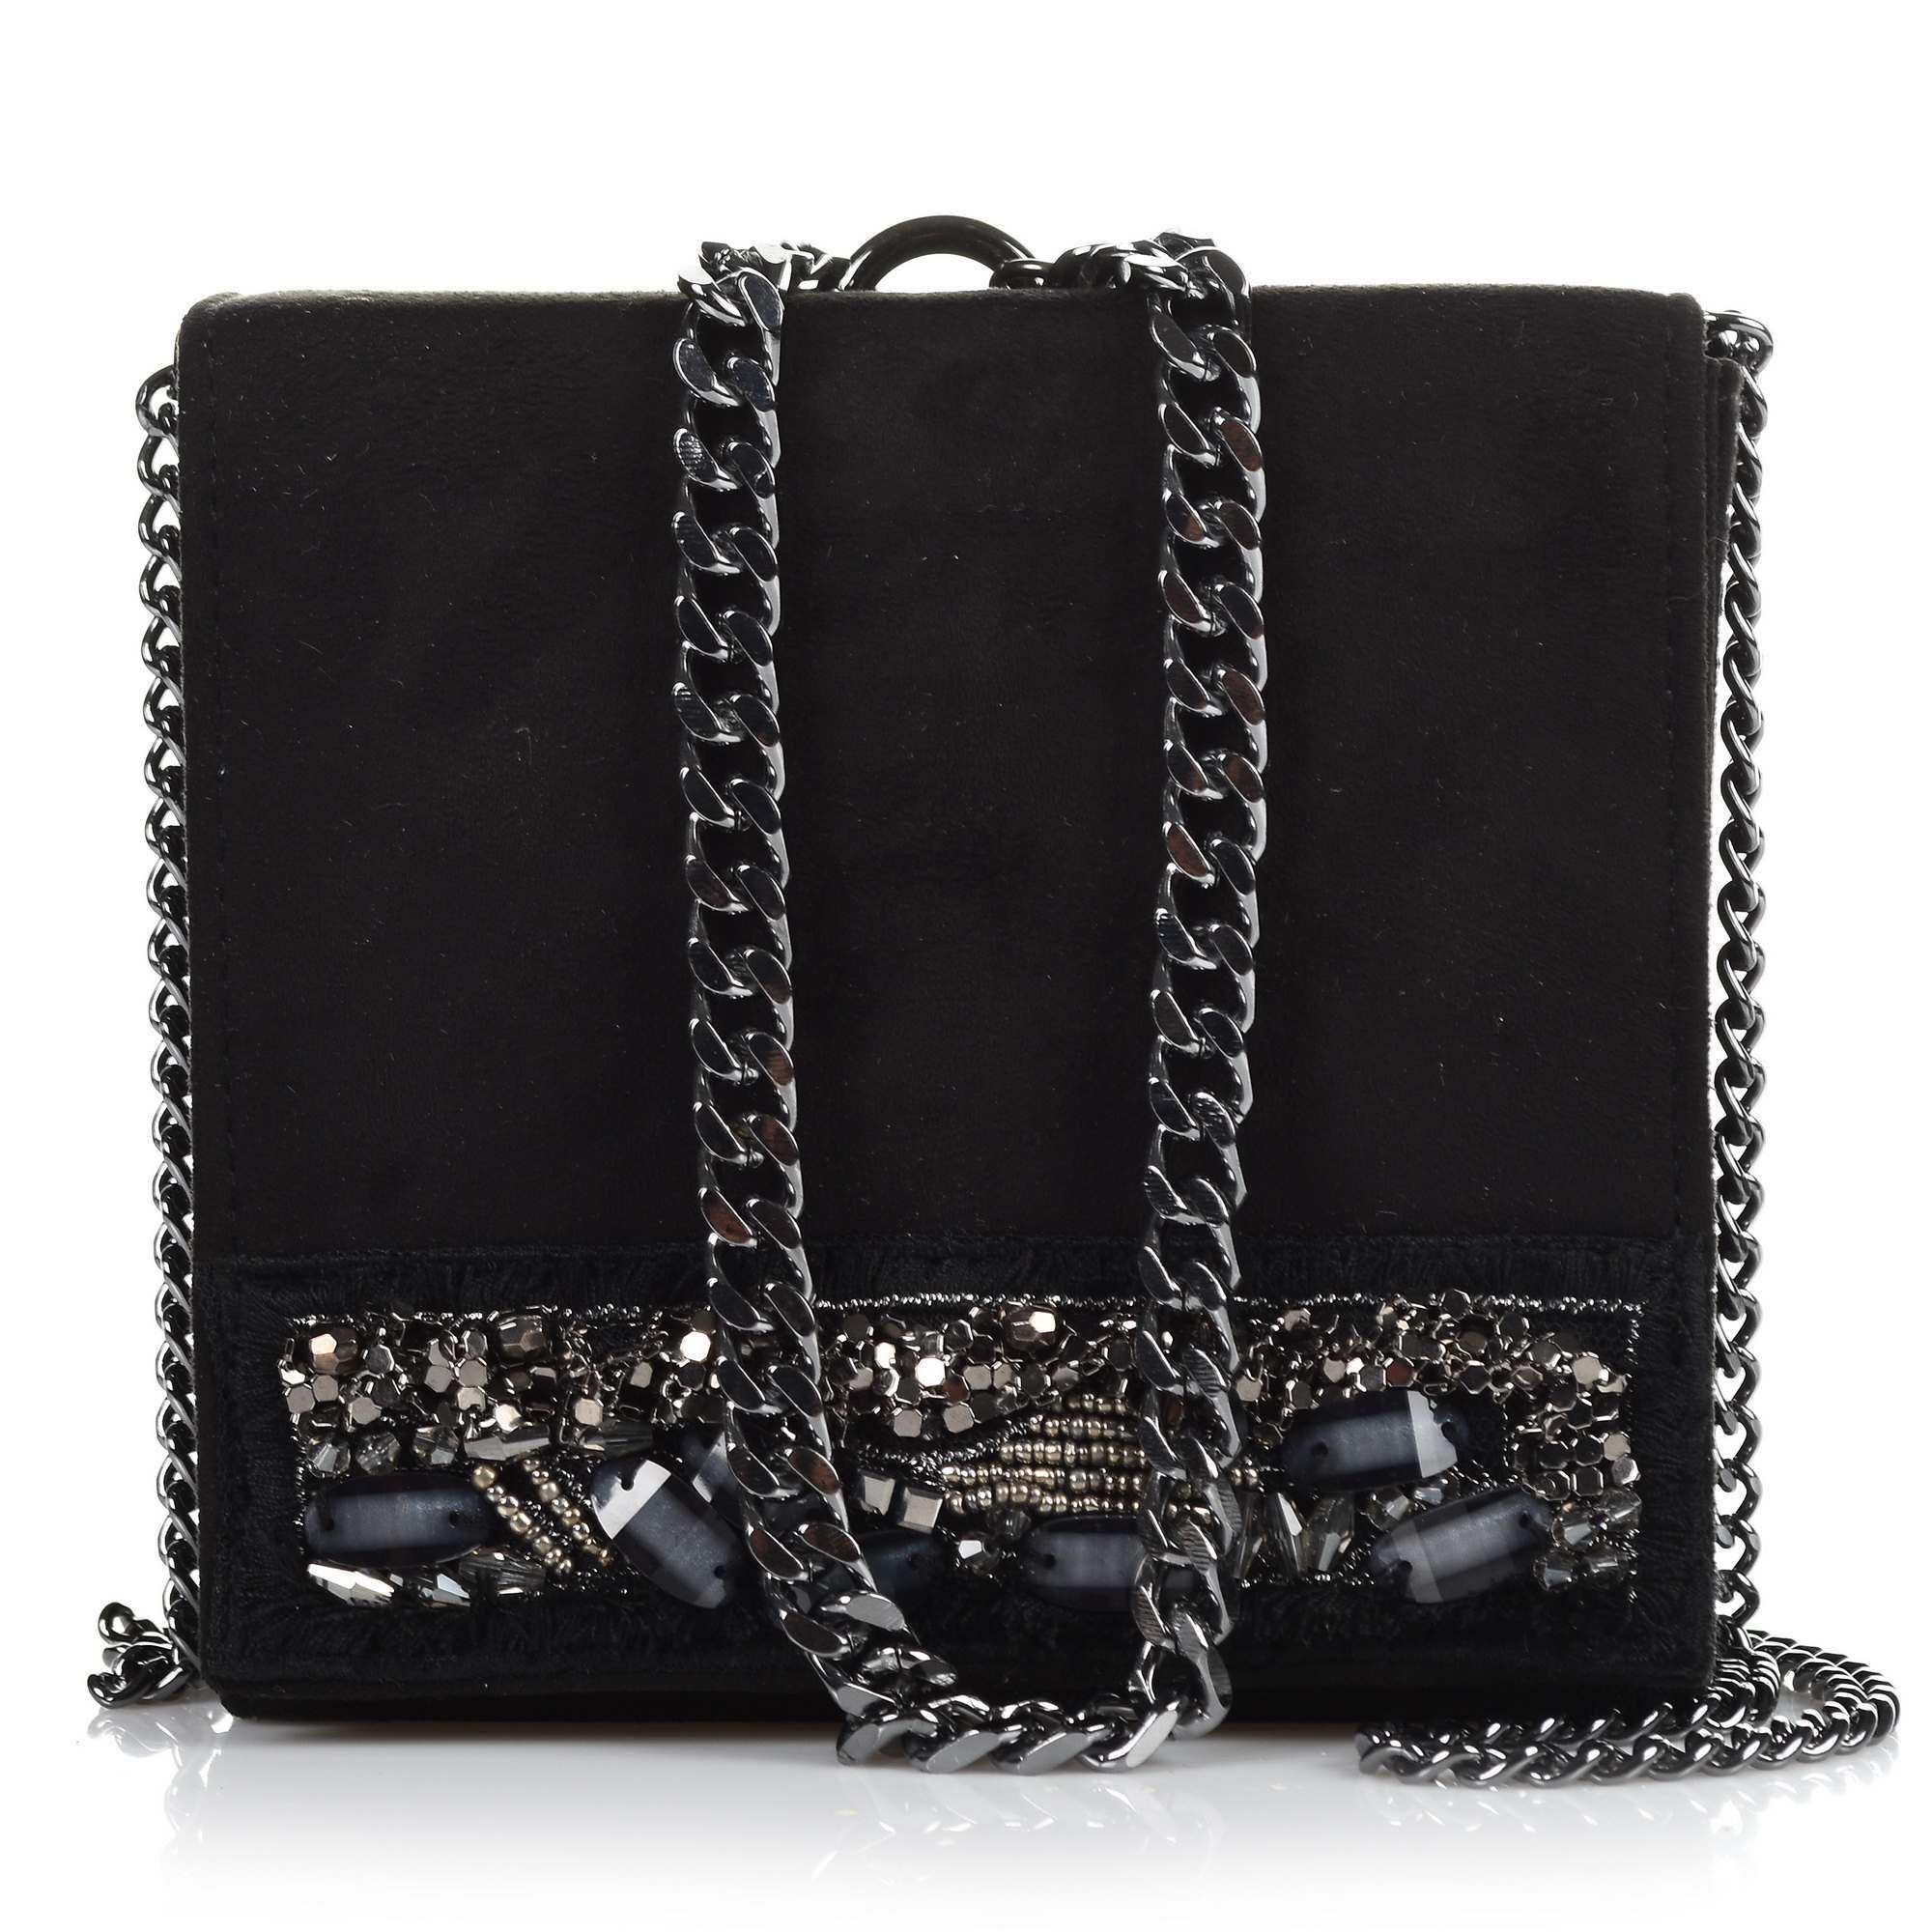 3ce66a3d73 Γυναικείες Τσάντες στο brandbags